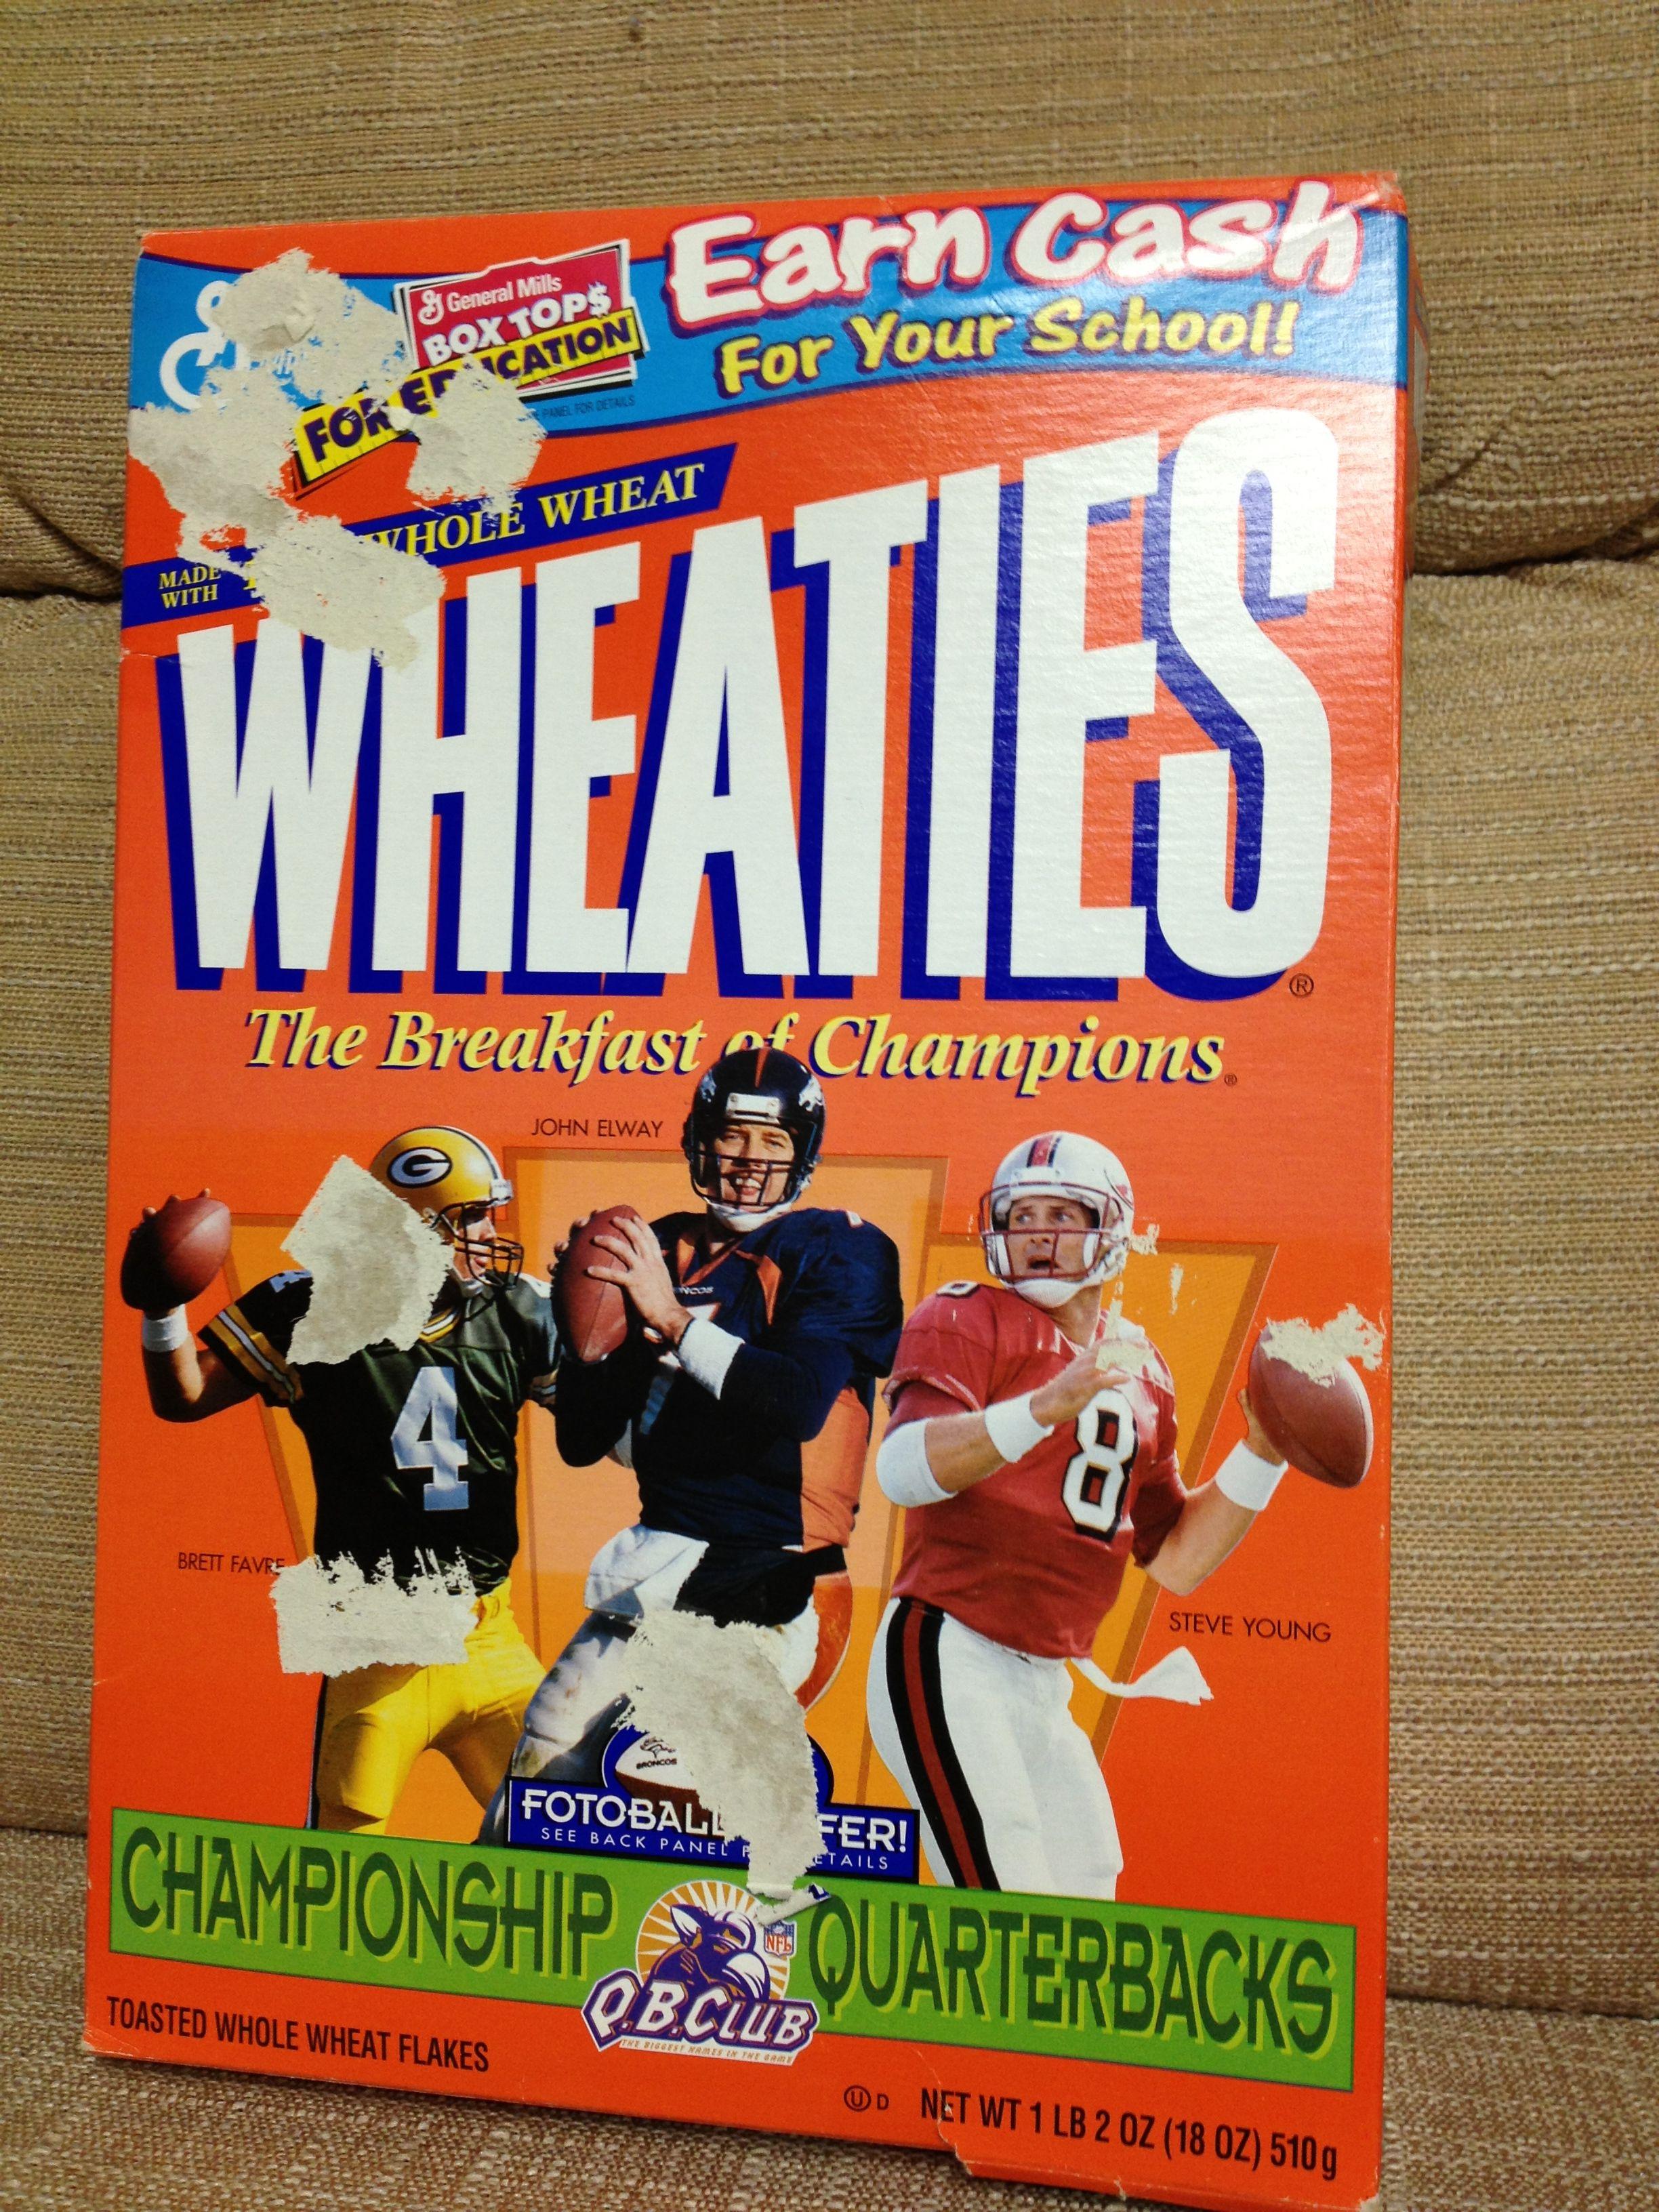 John Elway Wheaties Box Broncos Timeline Images Denver